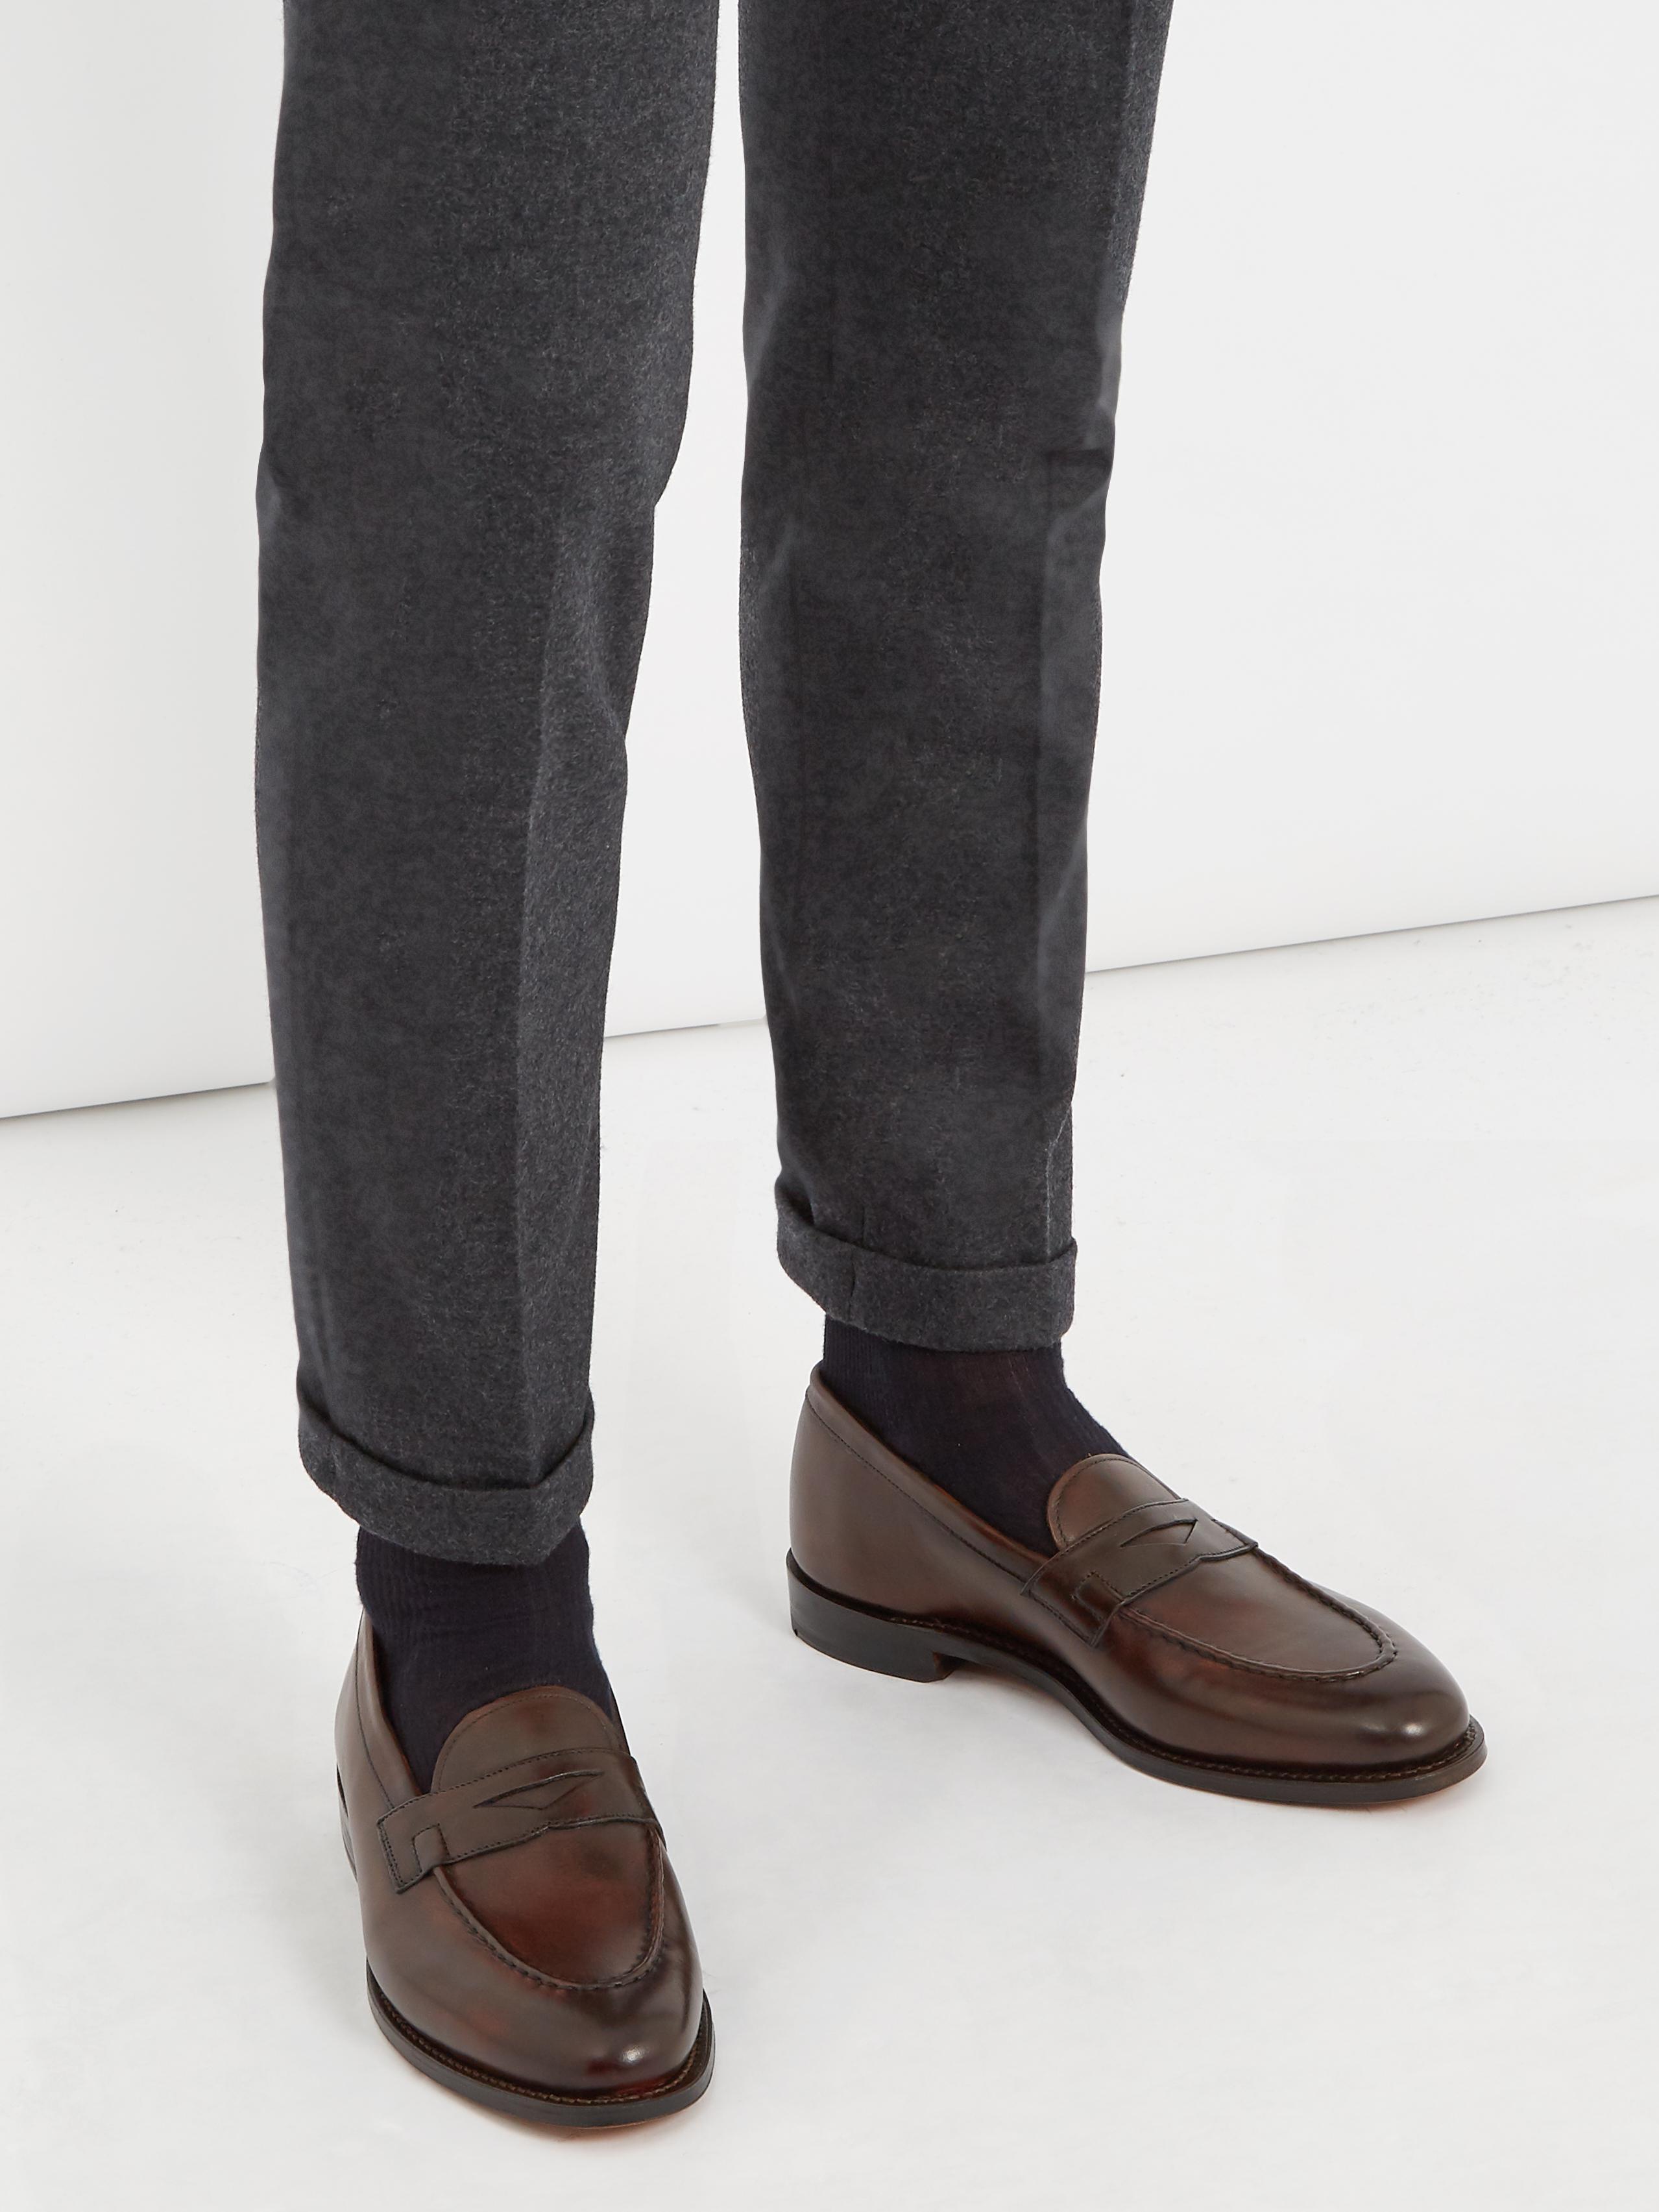 1c0bb5fffb8 Lyst - Grenson Lloyd Leather Loafers in Brown for Men